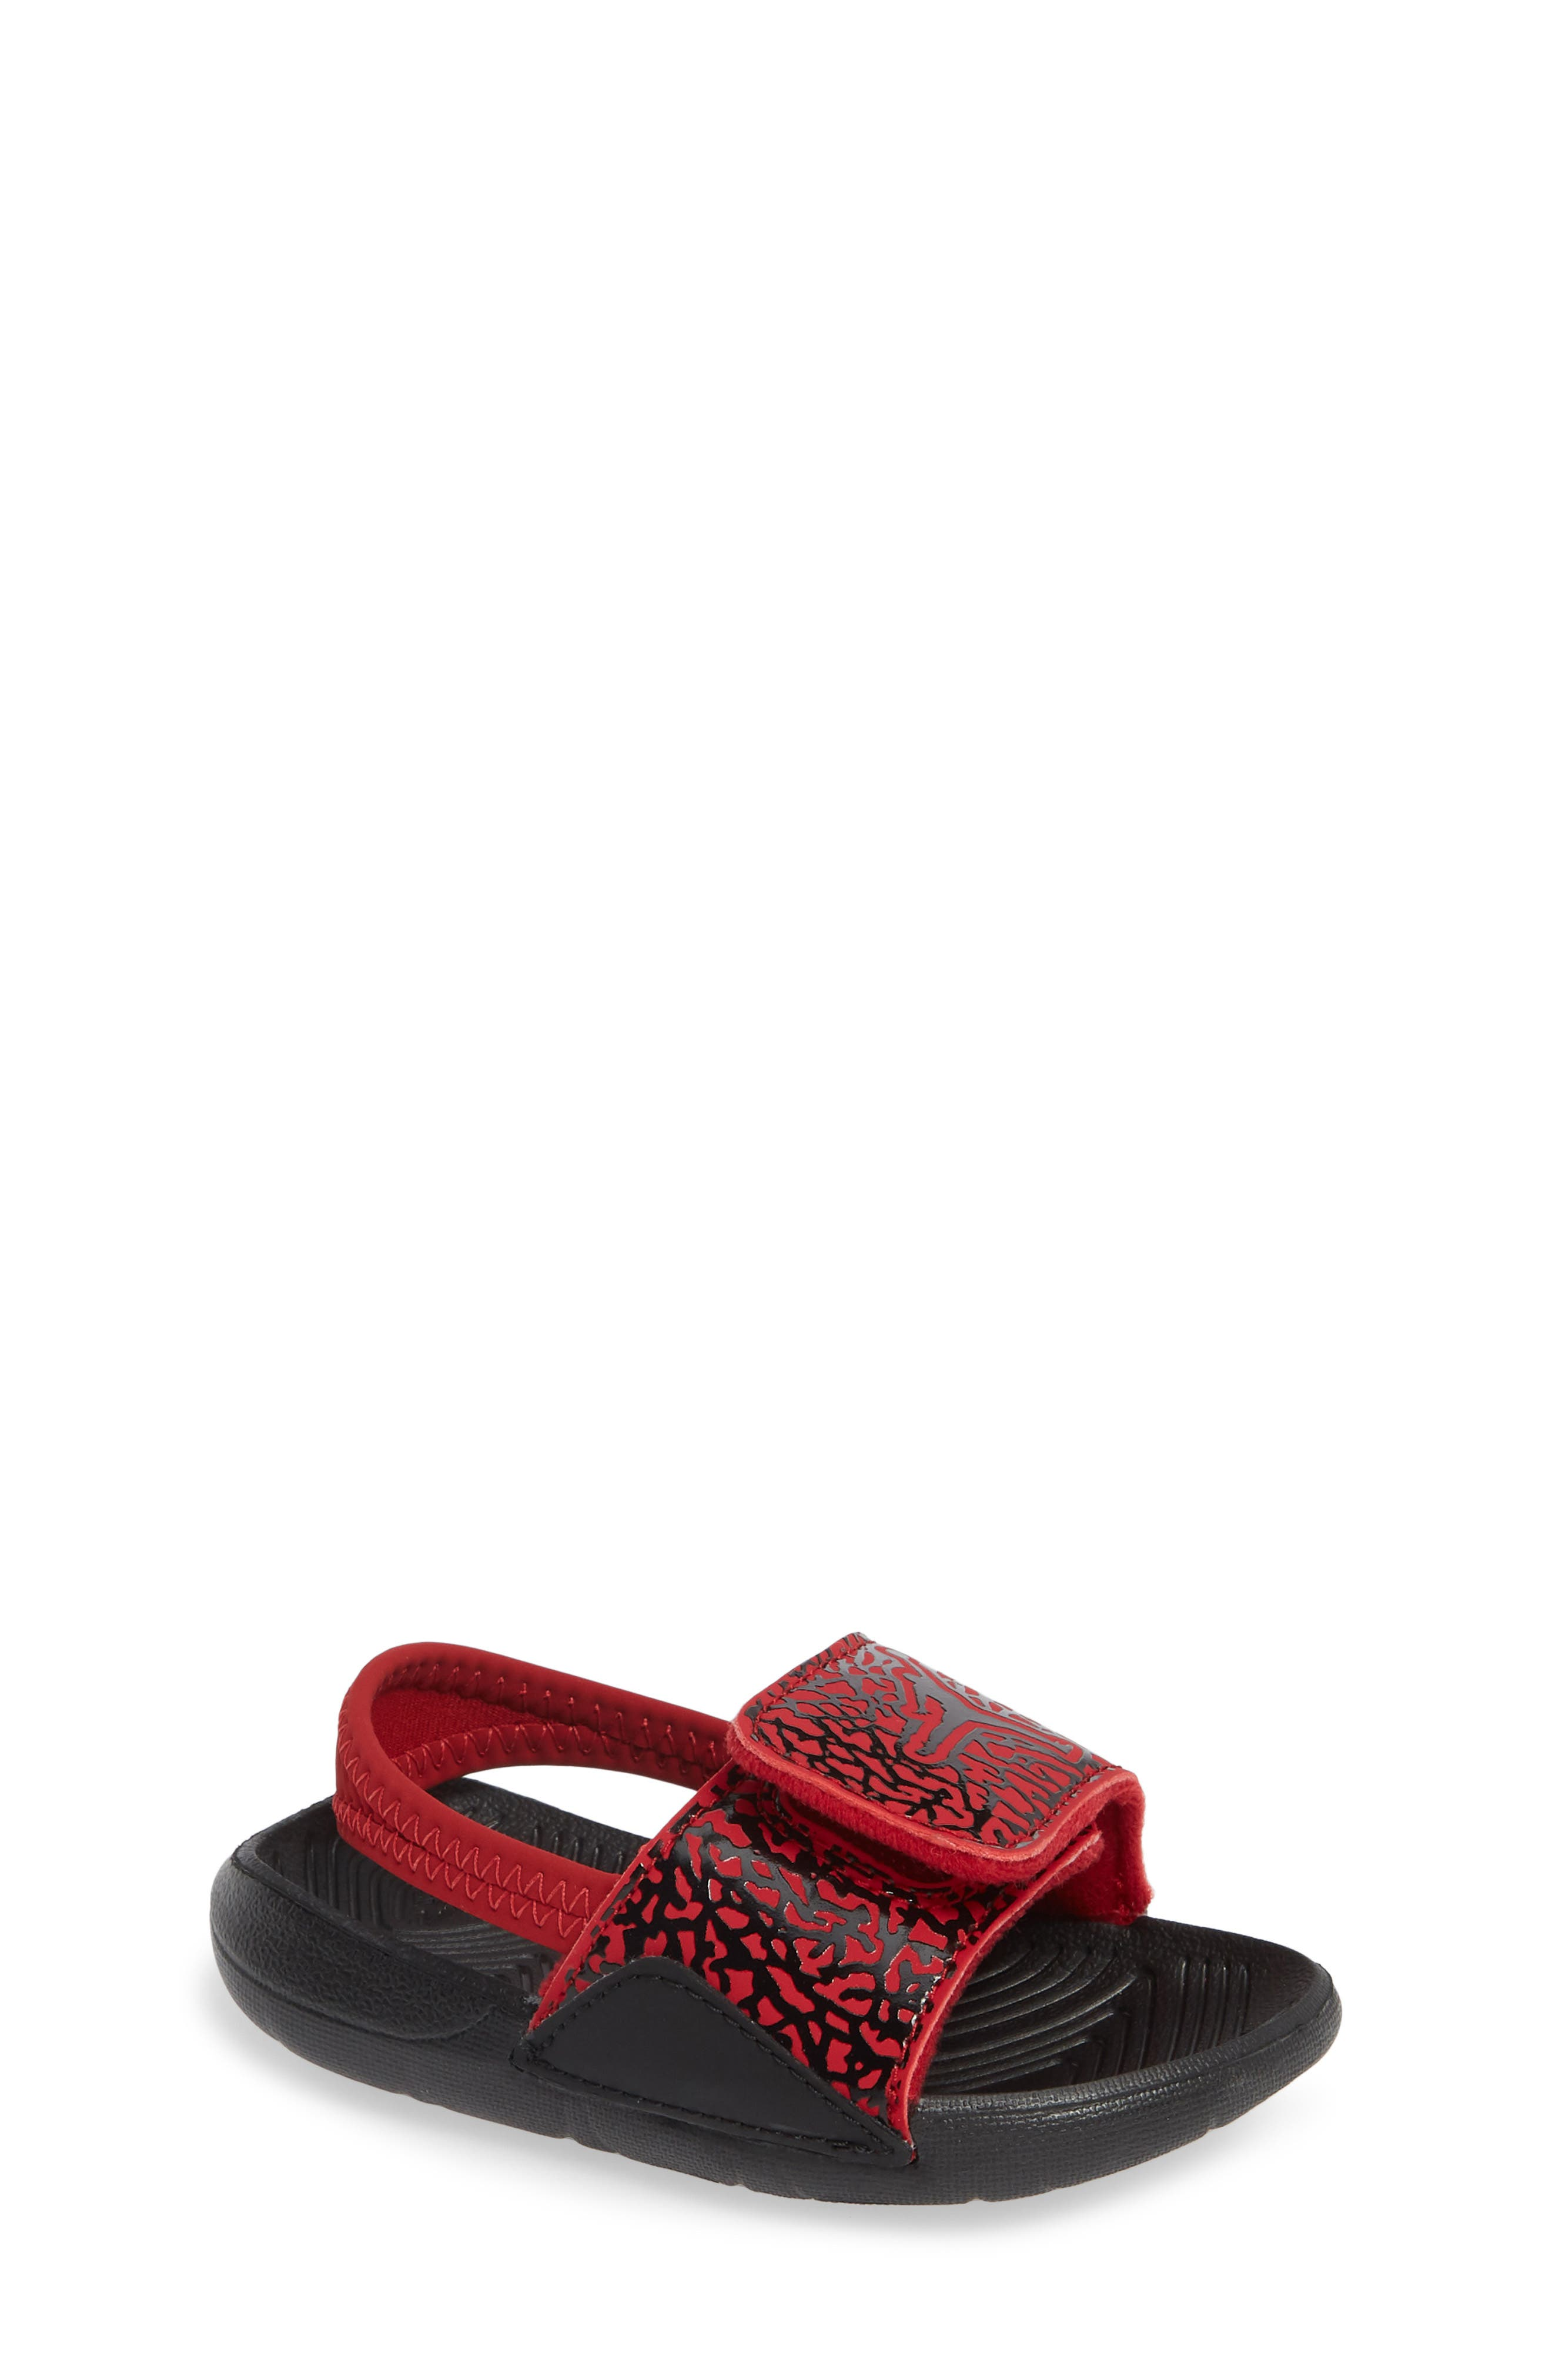 Hydro 7 V2 Sandal, Main, color, GYM RED/ BLACK 2